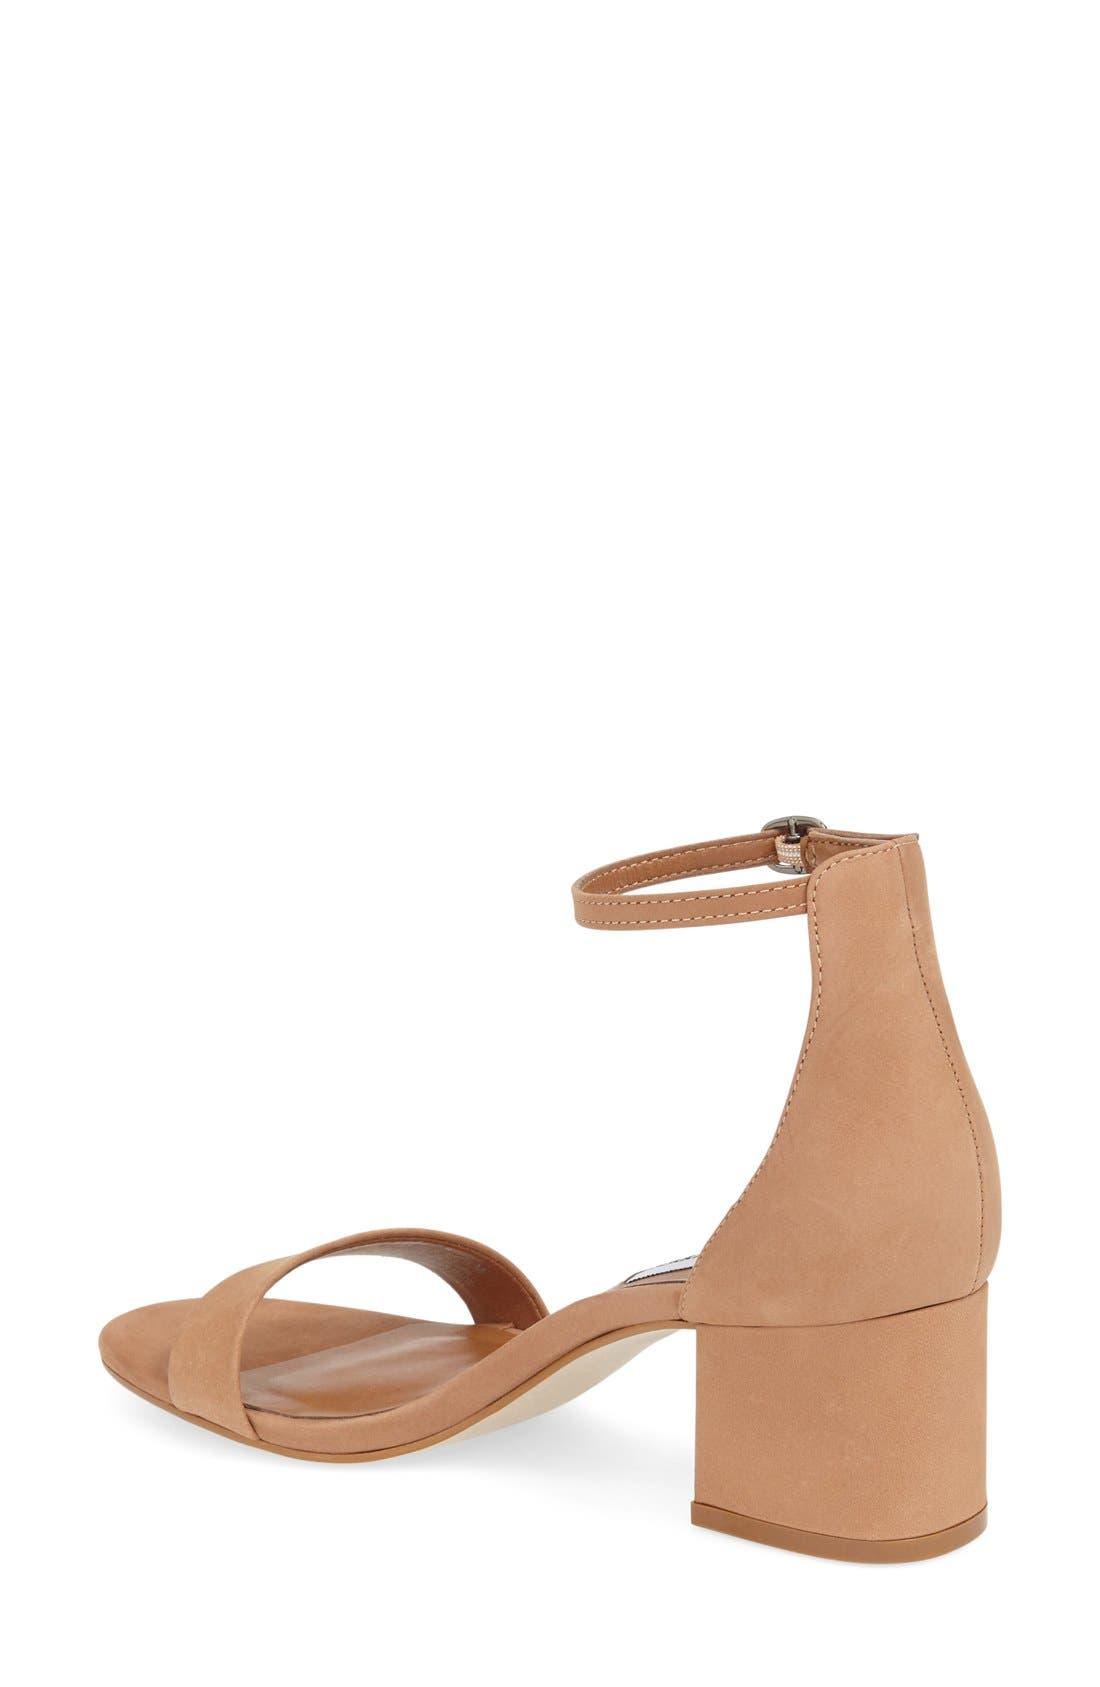 Black leather sandals low heel - Black Leather Sandals Low Heel 25